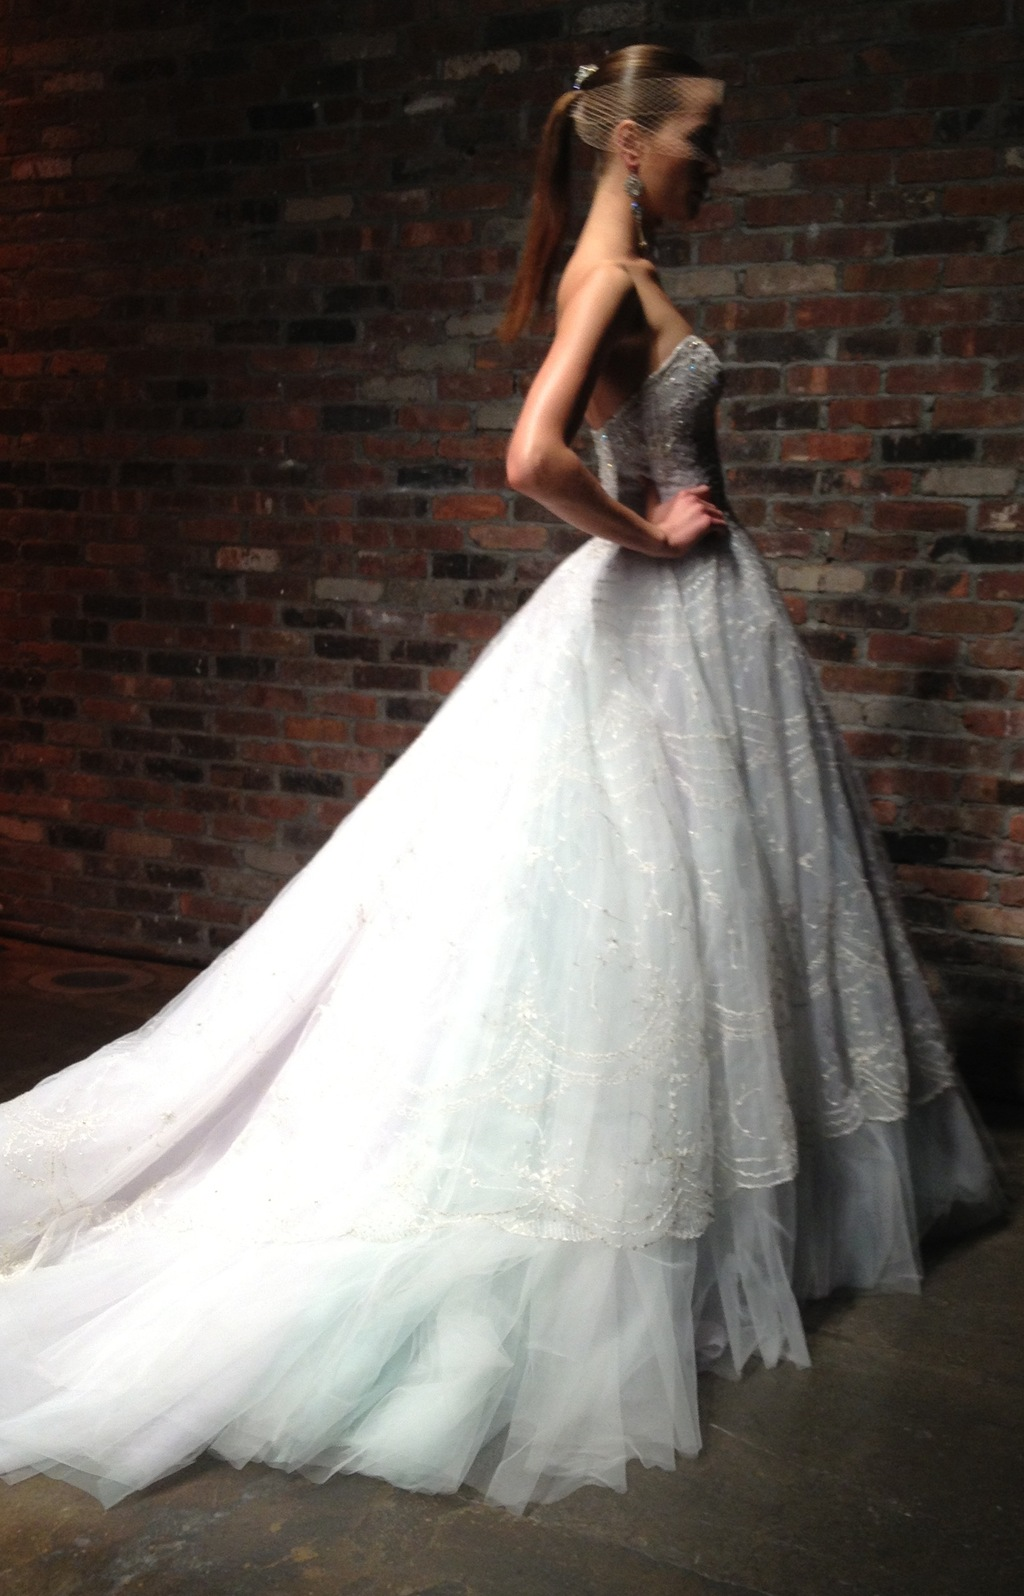 Spring-2013-wedding-dress-guess-the-designer-3.full